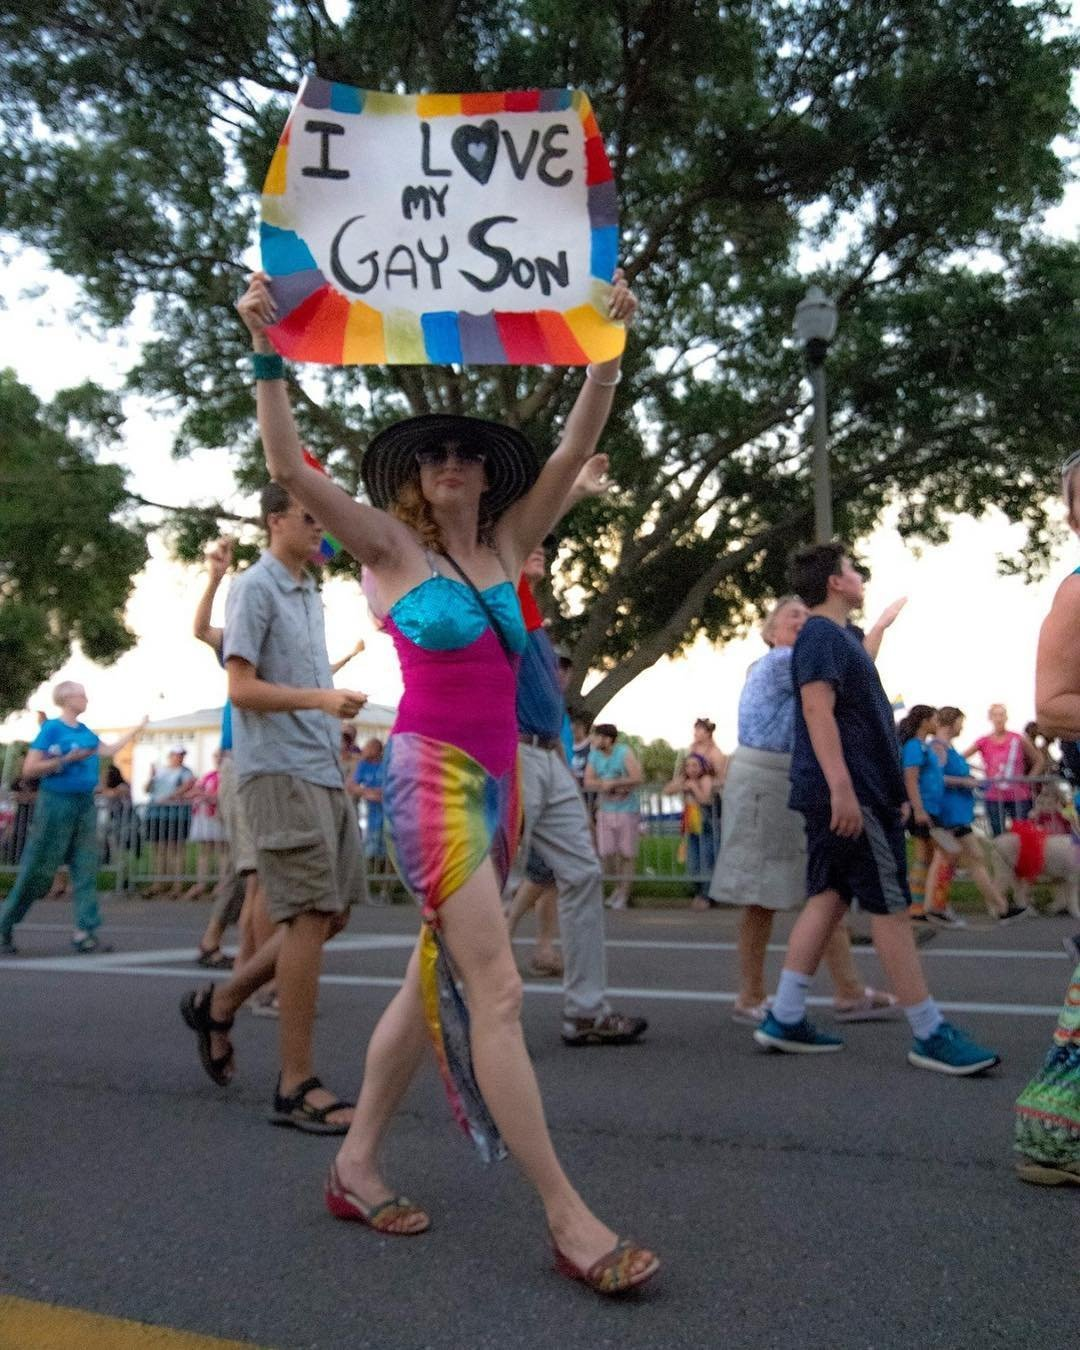 #Pride @vspc #liveamplified @stpetefl @pinellascounty #stpetersburgflorida #dtsp #igersstpete #gaypride #proudmom #proudmommy #love  @love @natgeo #natgeo #life